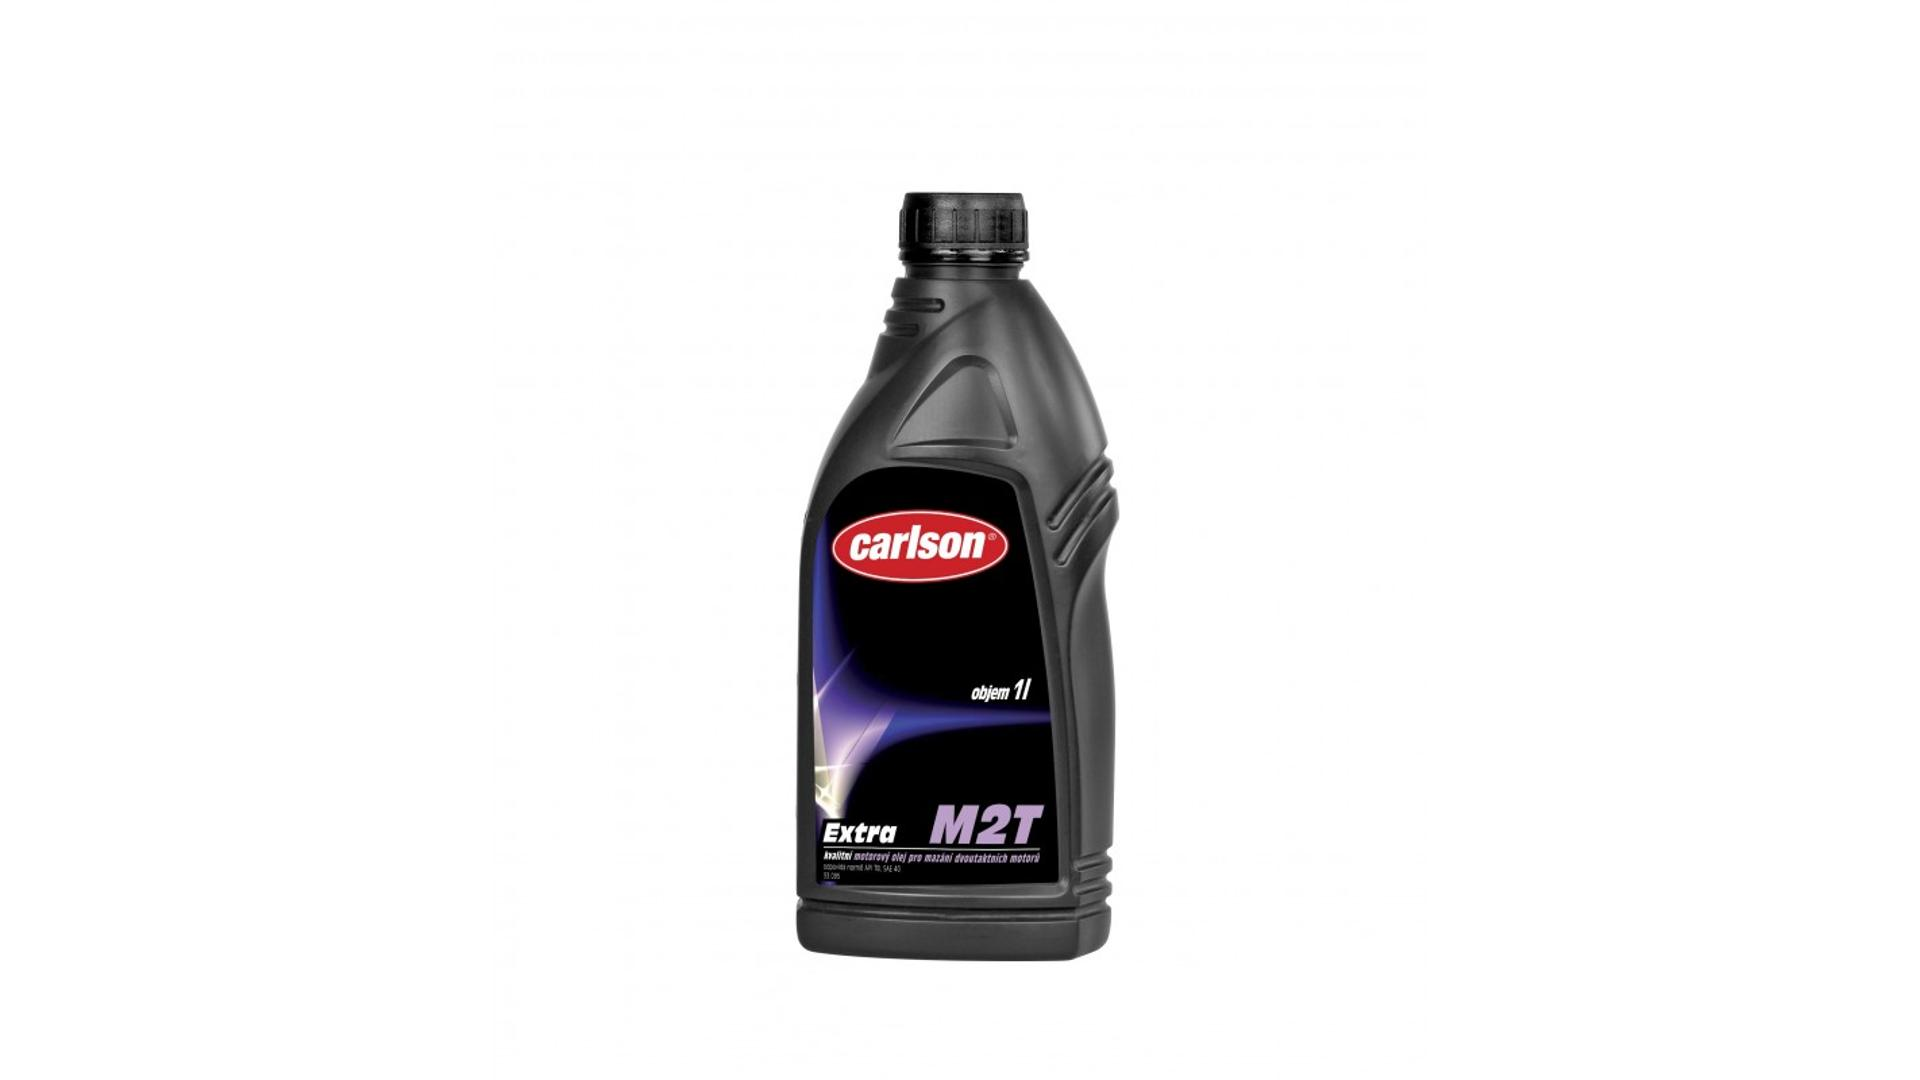 CARLSON EXTRA M2T SAE 40 - 1L